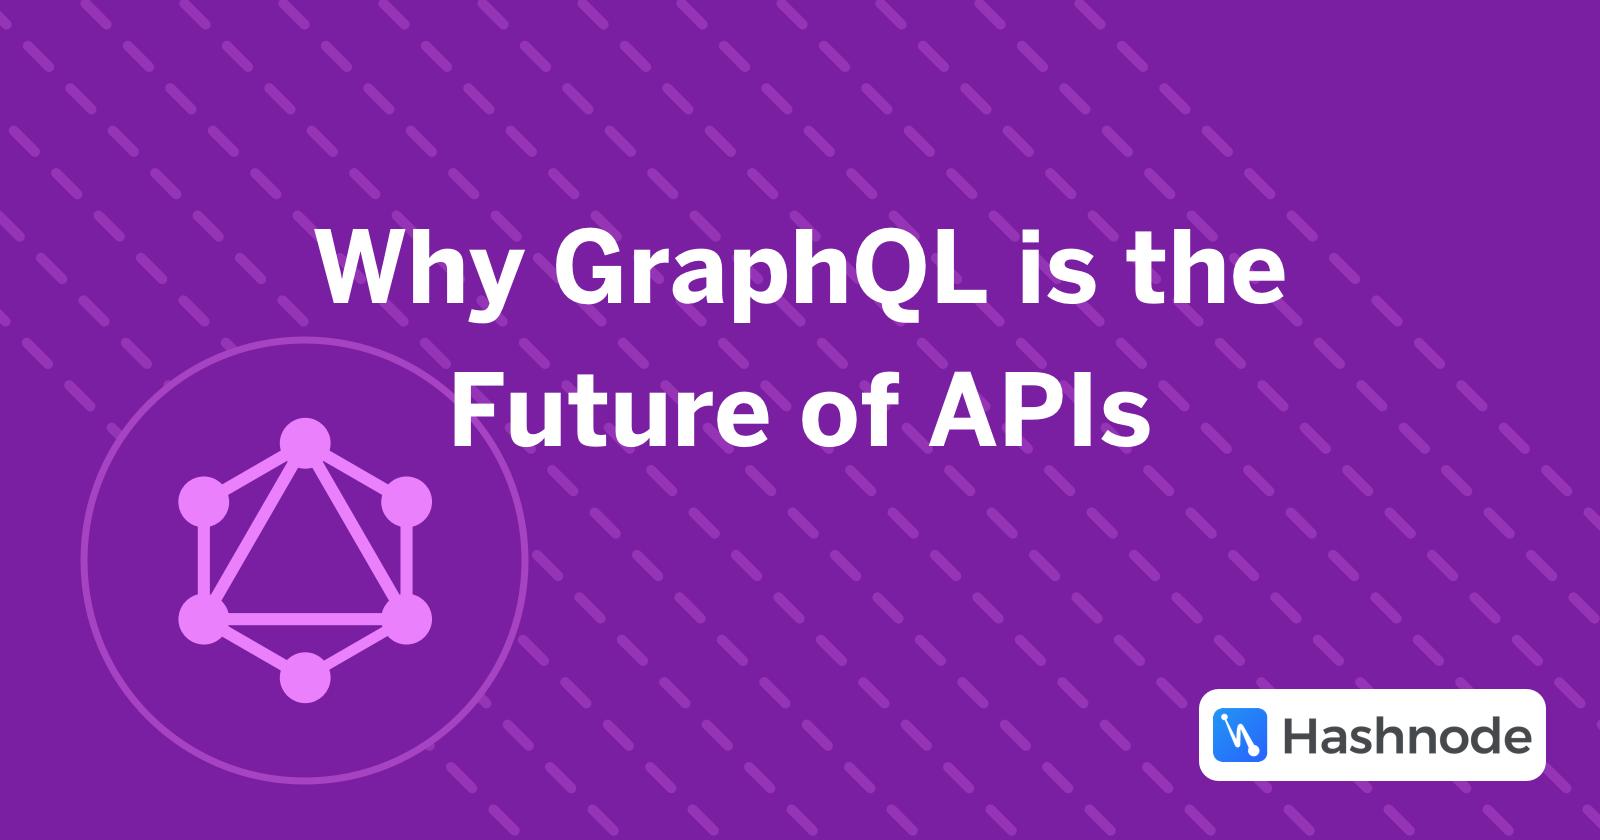 Why GraphQL is the Future of APIs - Hashnode